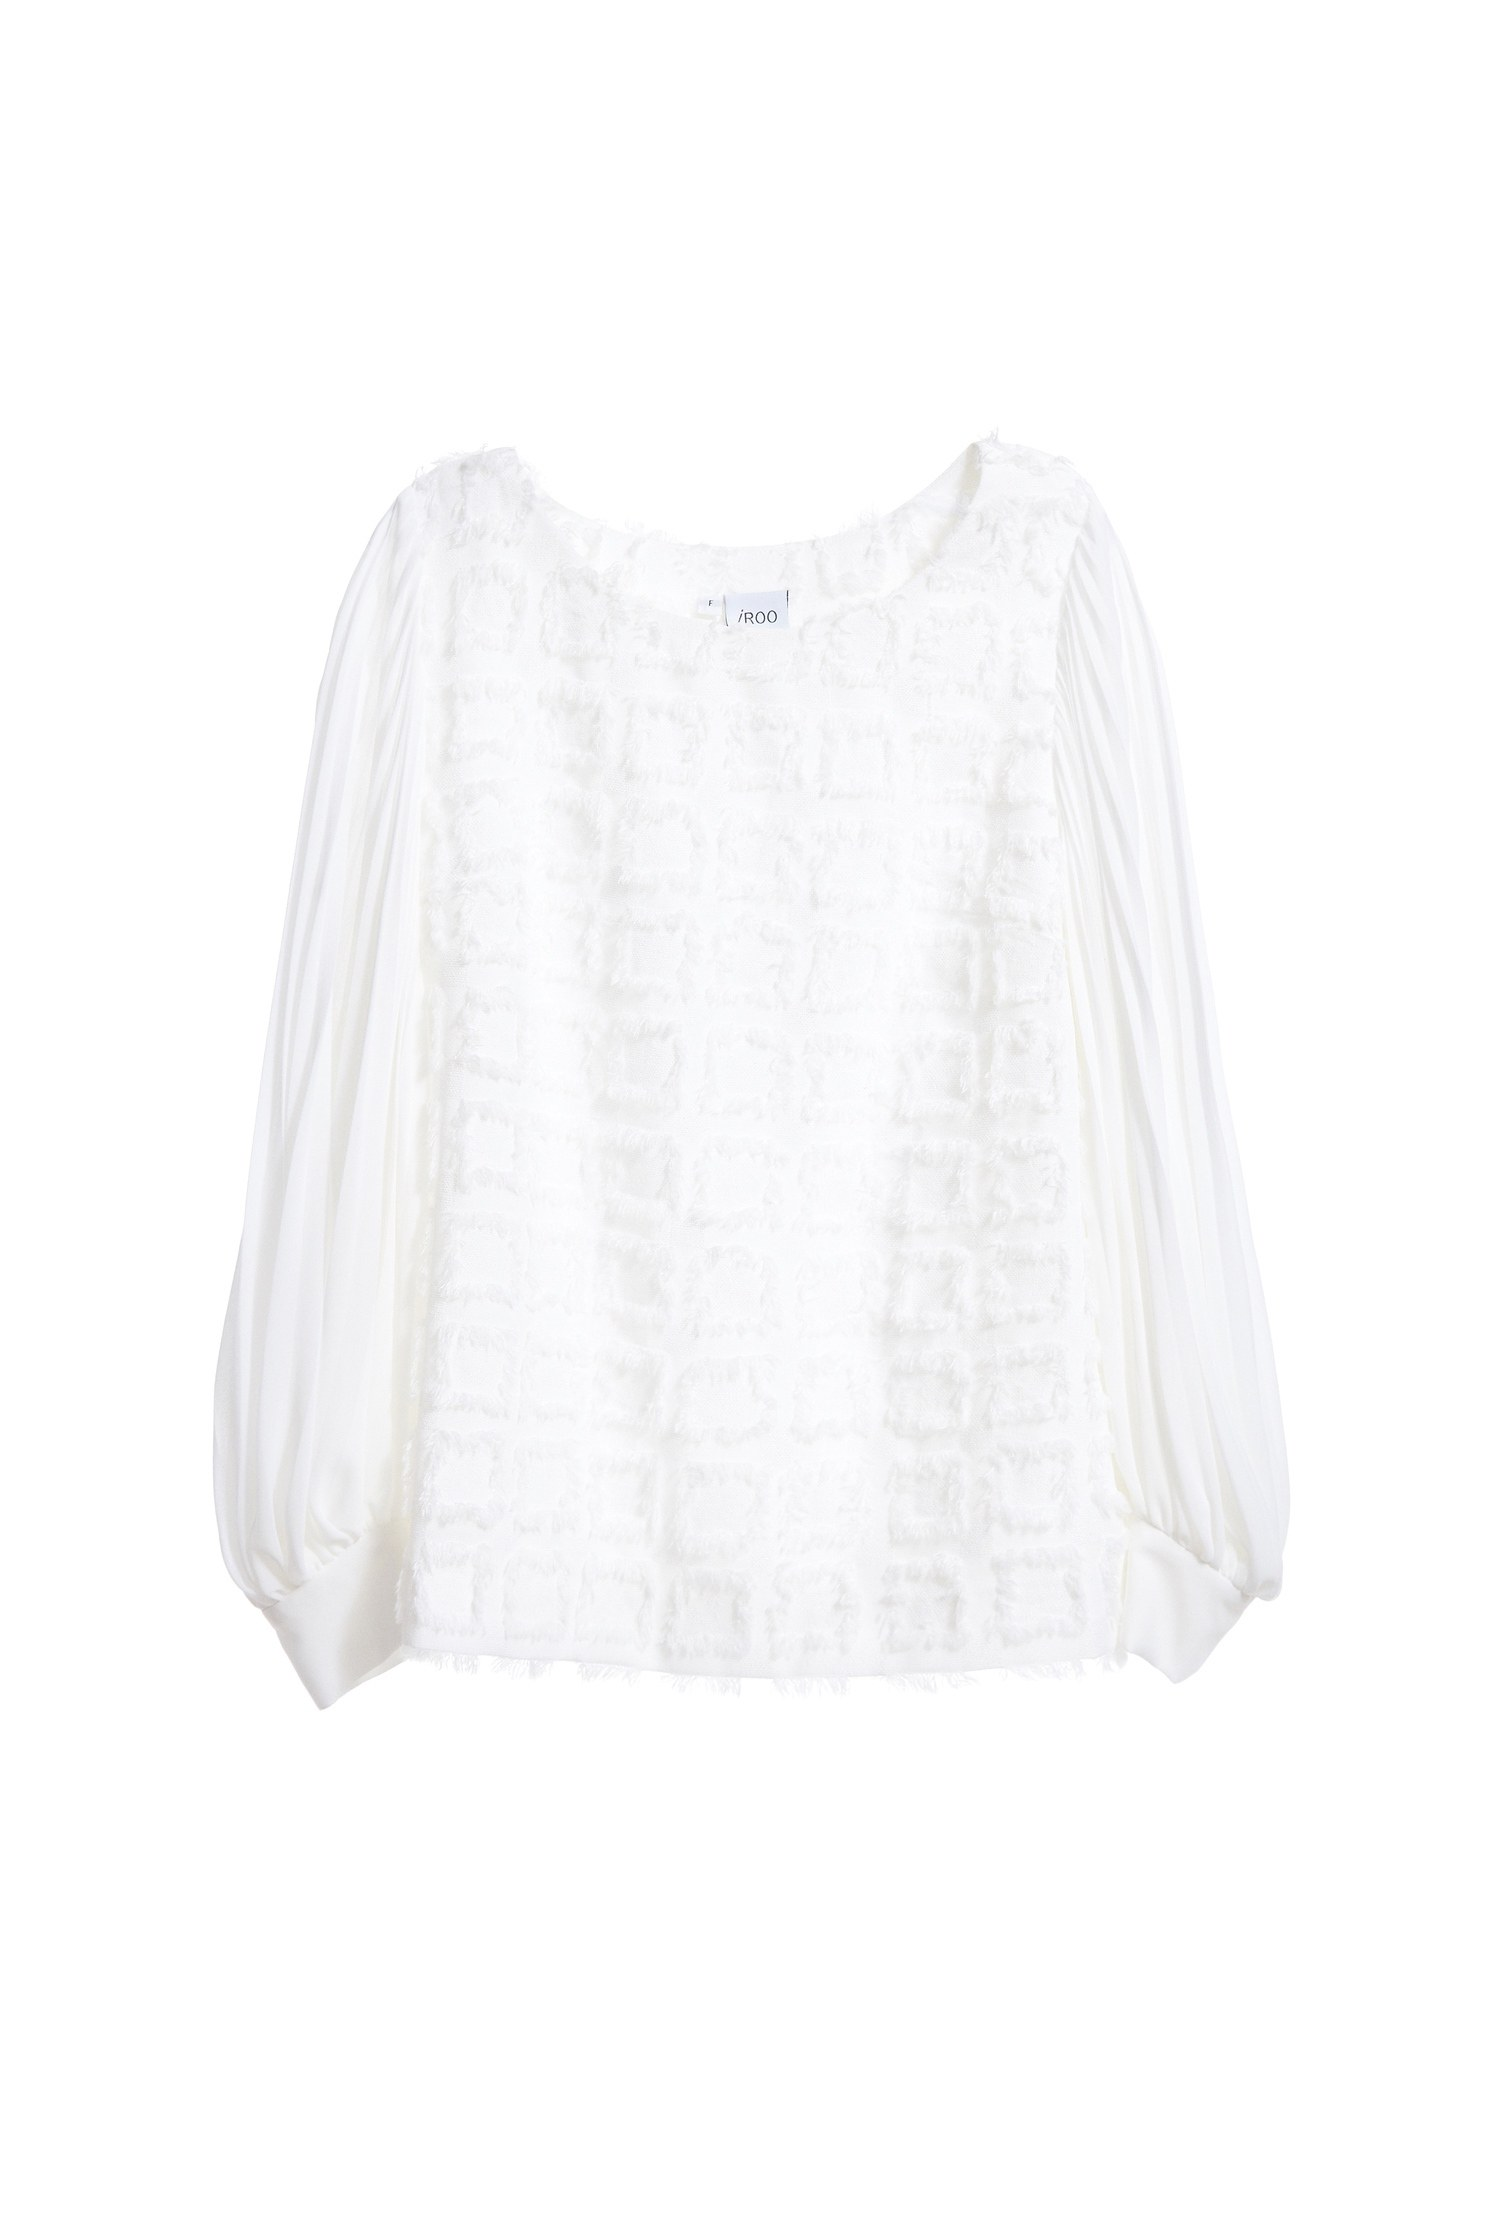 Romantic see-through lace chiffon top